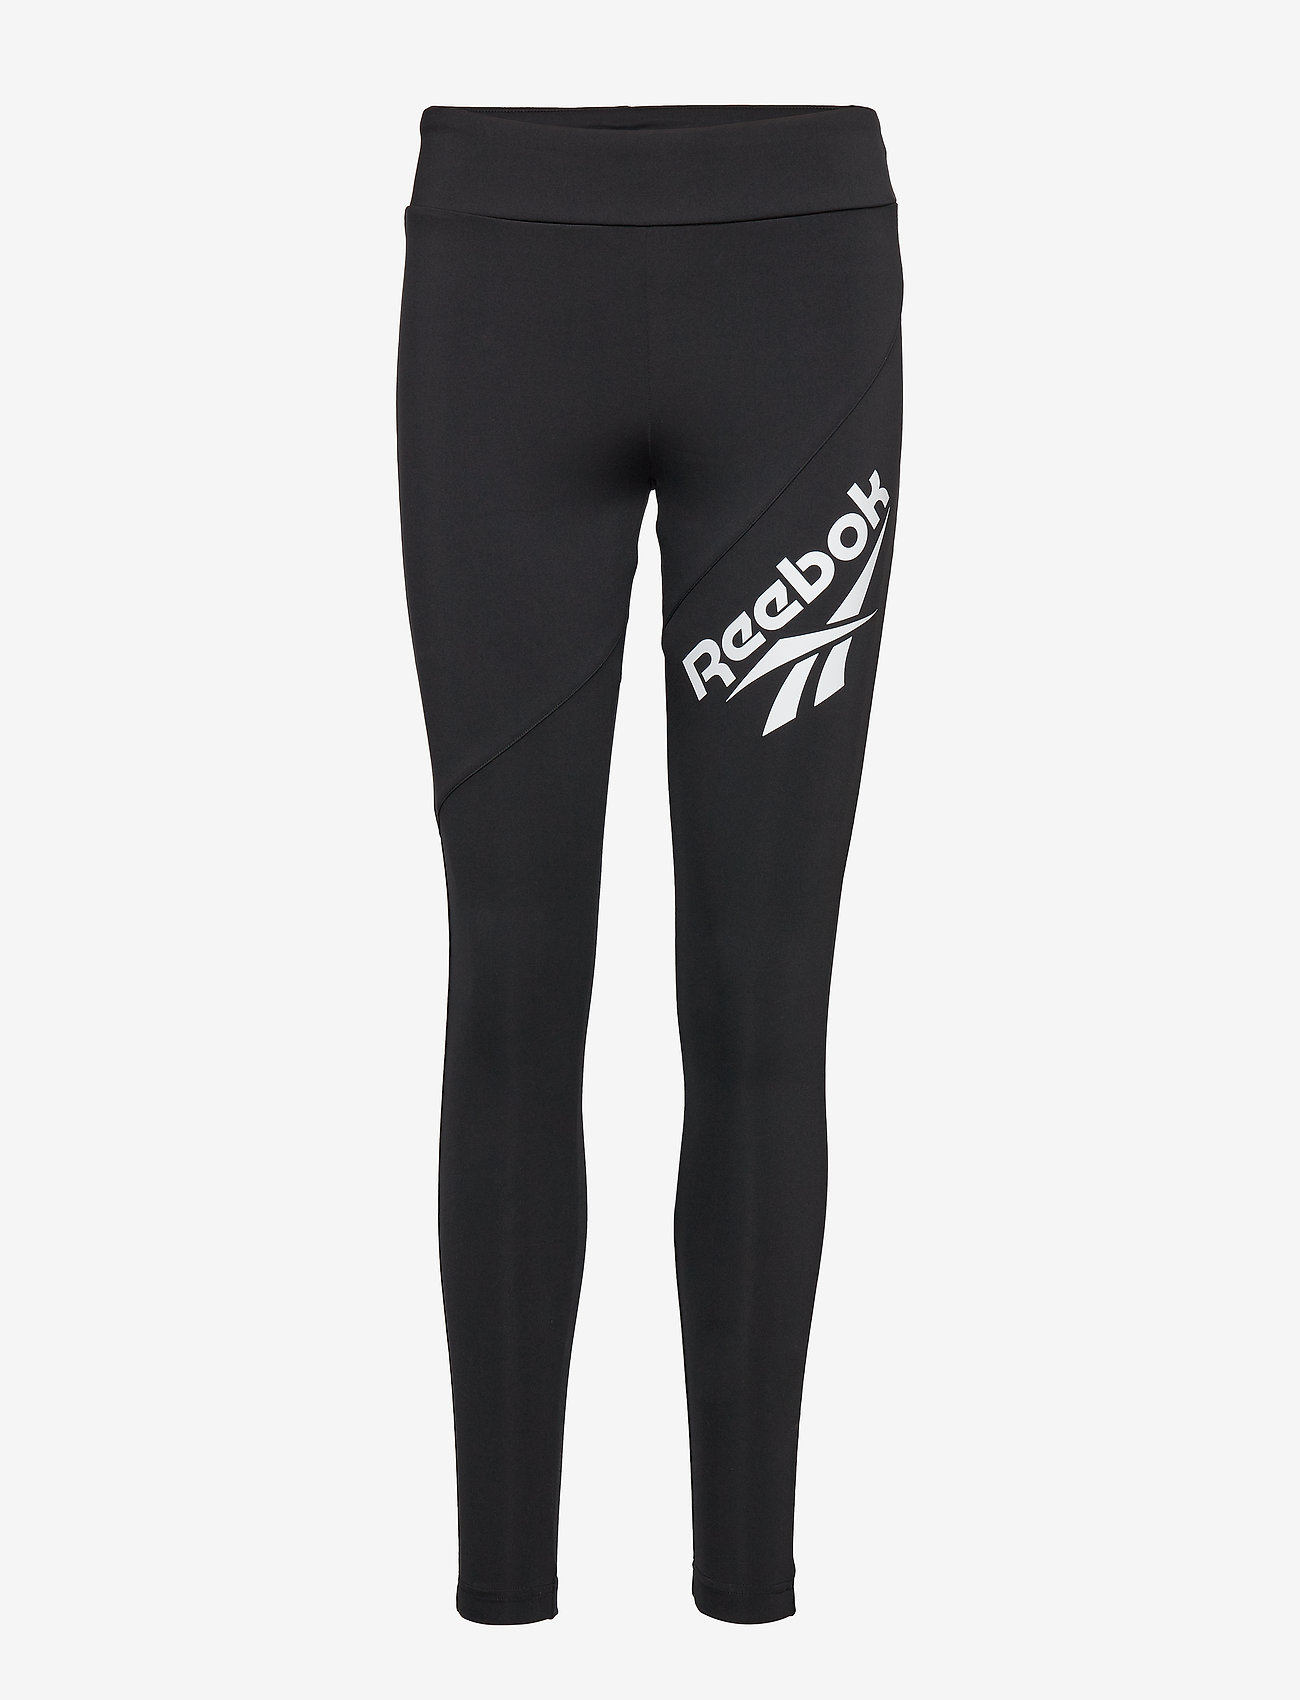 Reebok Classics - CL V P LEGGING - leggings - black - 1